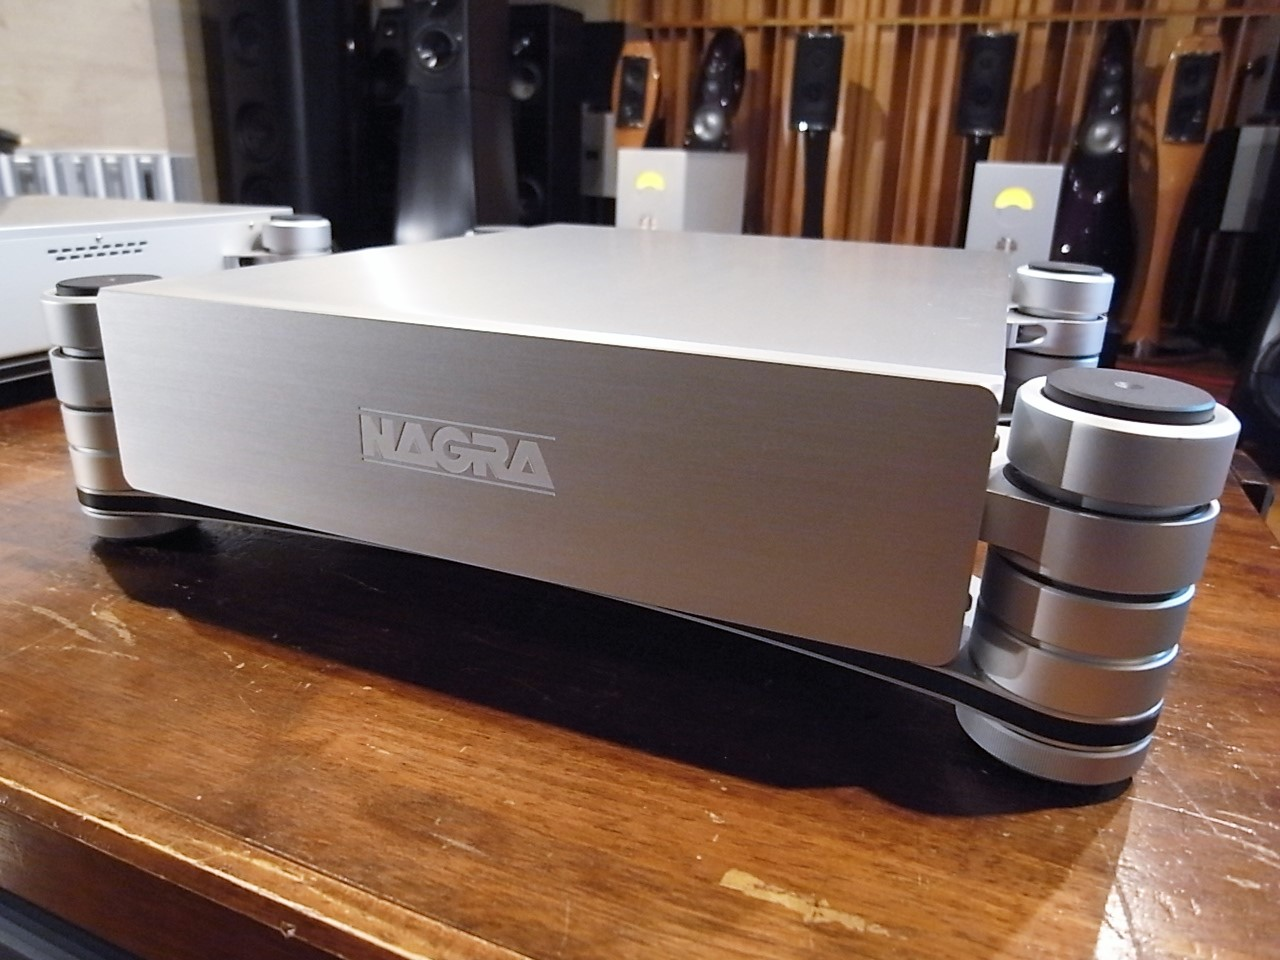 NAGRA HD PREAMP